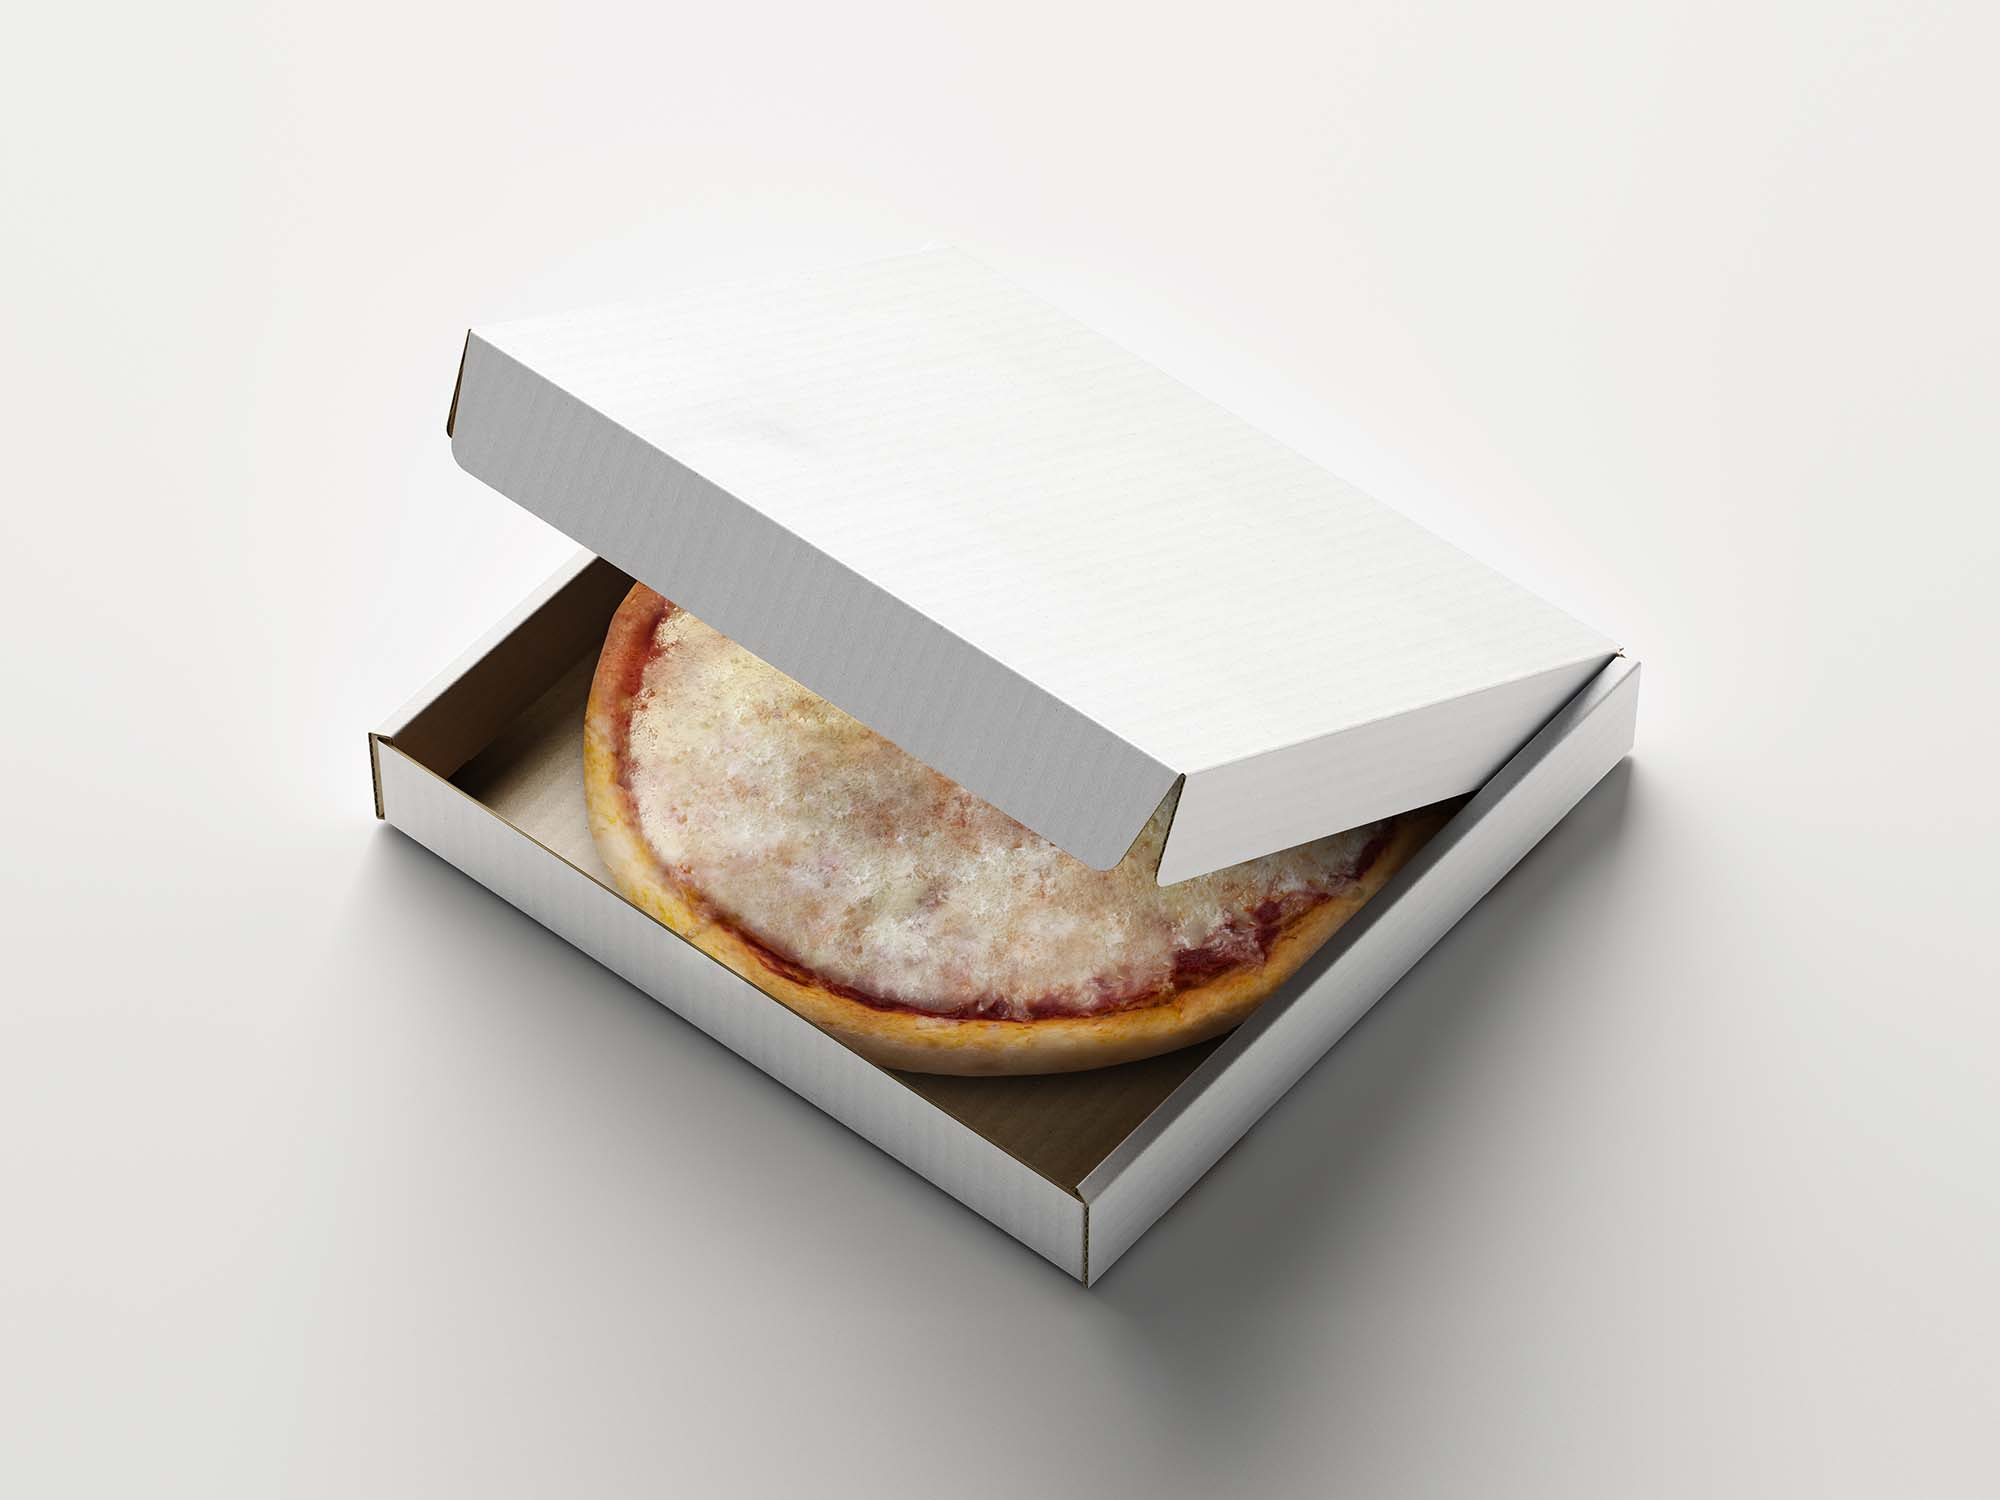 Opened Pizza Box Mockup 3